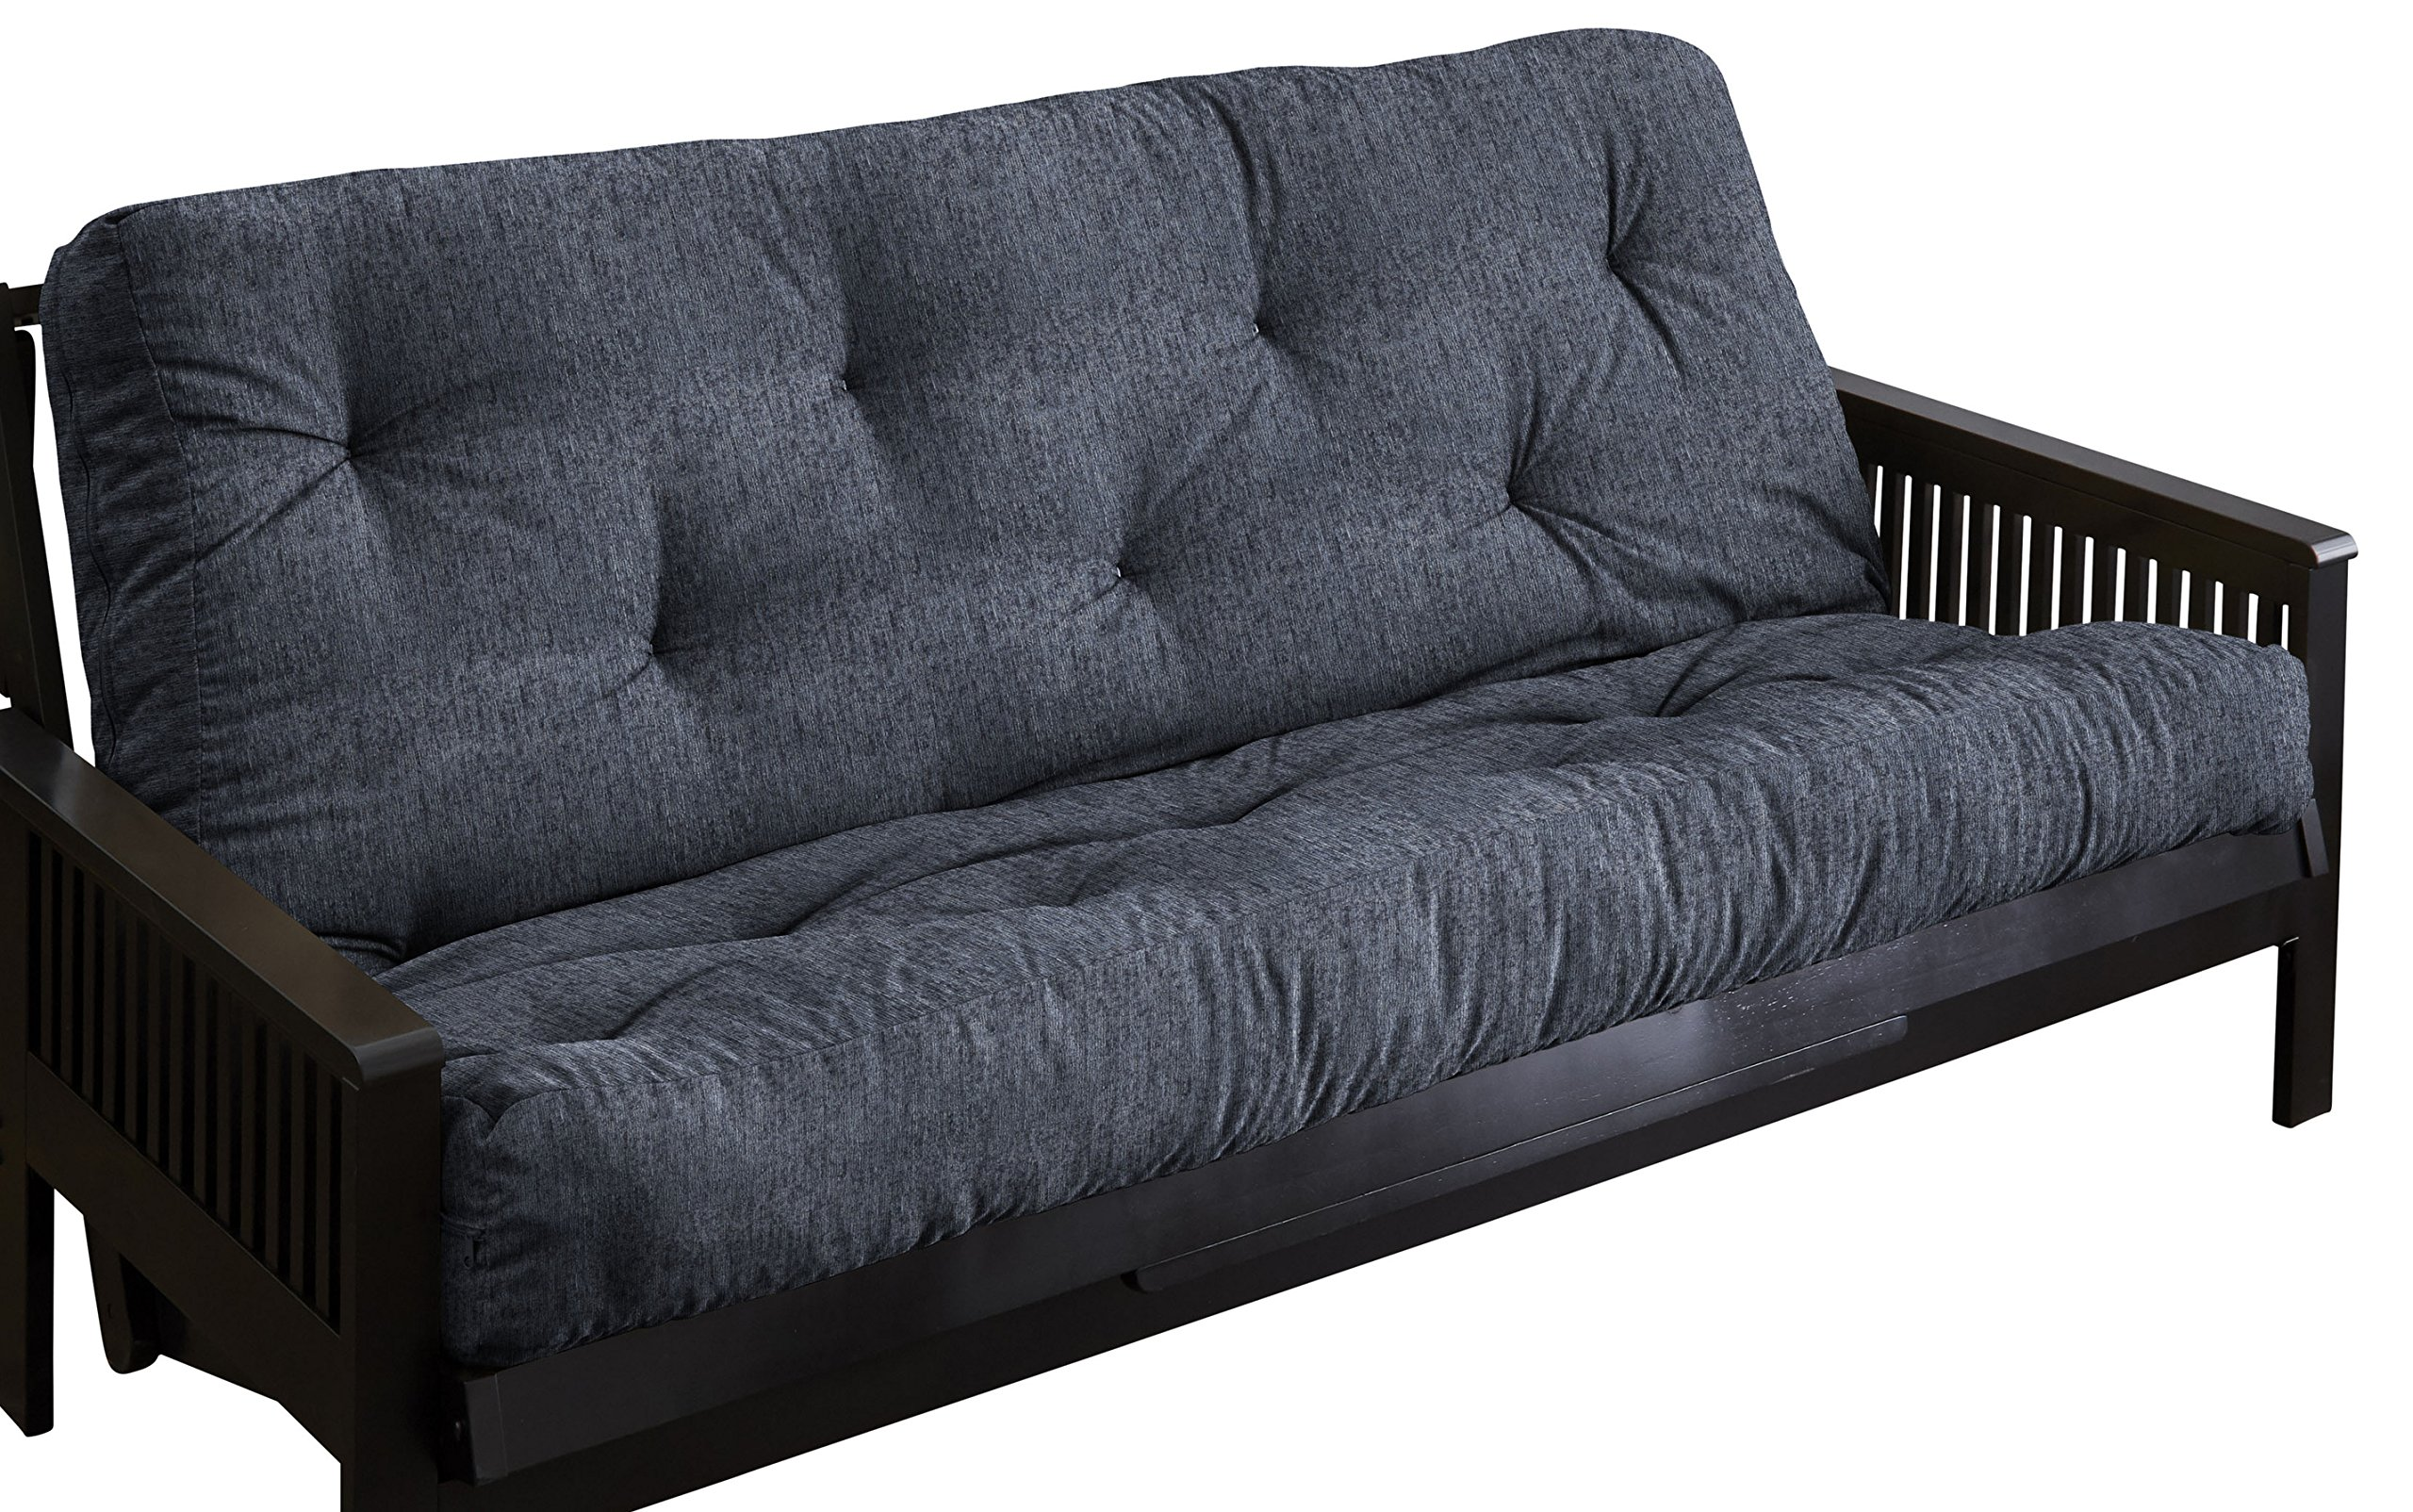 Mozaic AMFT114910 Textured Blue Grey Full Size 5'' Thick Futon Mattress by Mozaic